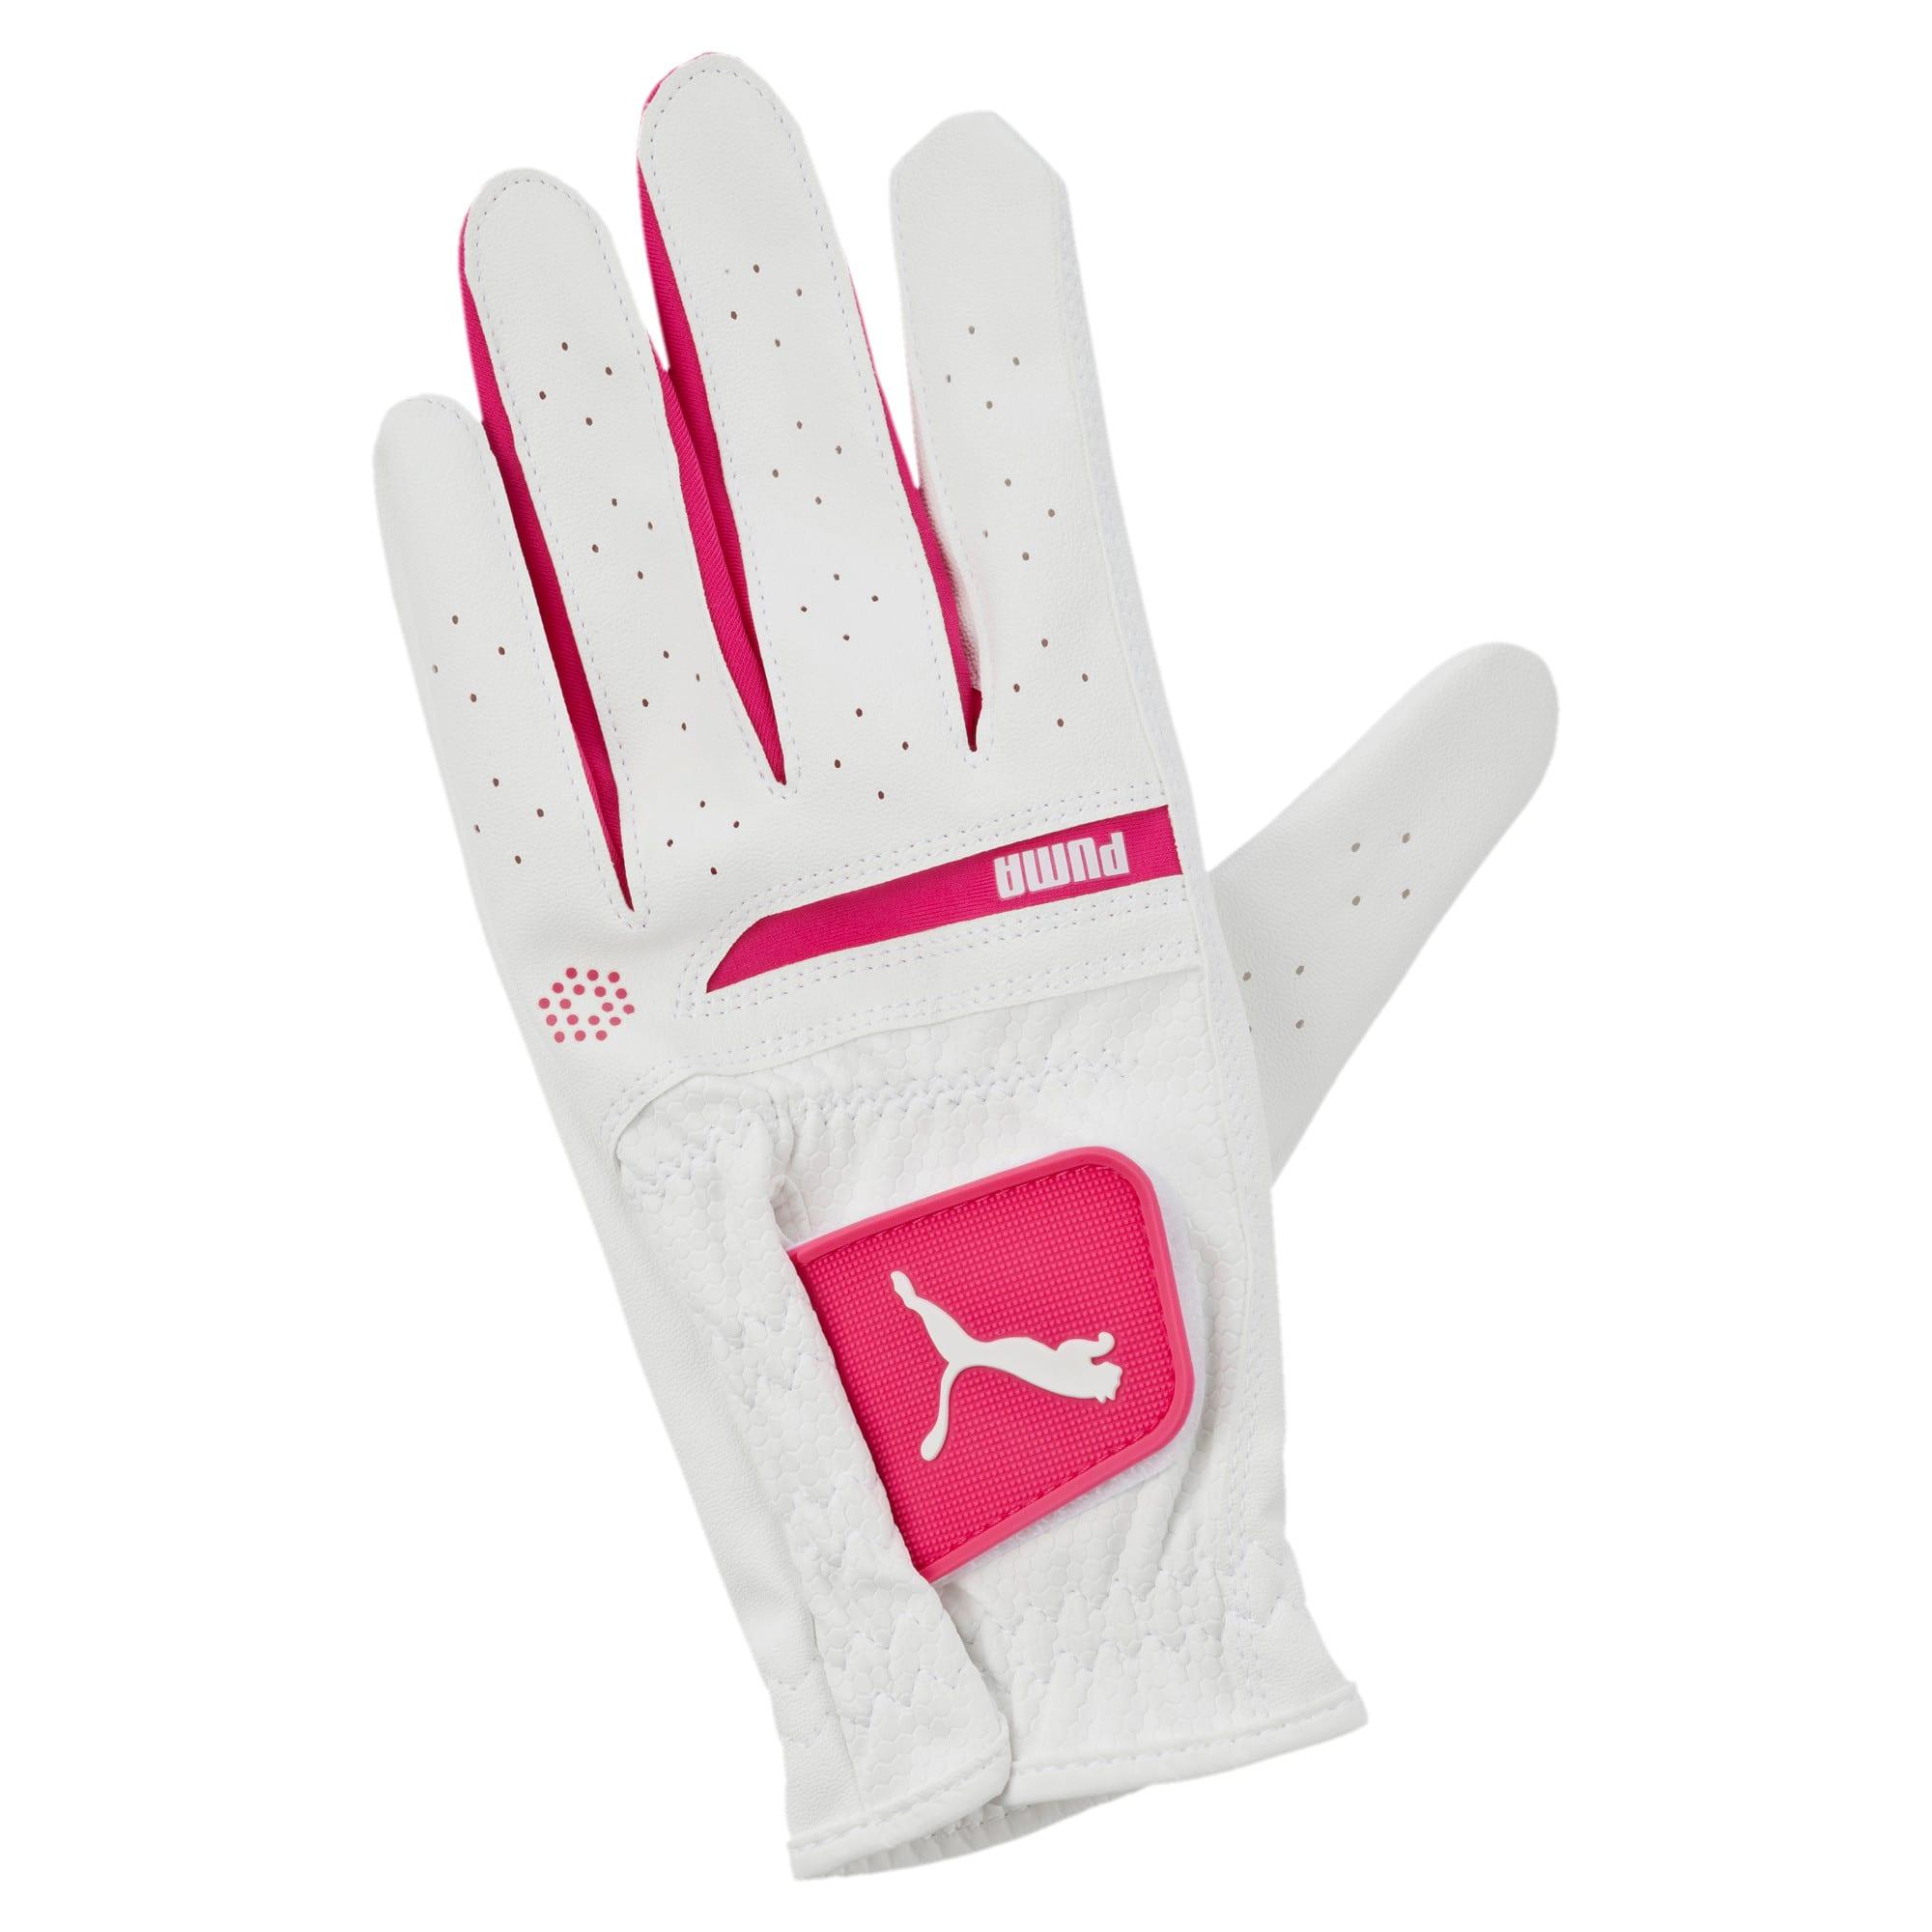 Thumbnail 1 of Golf Women's Flexlite Performance Left Hand Glove, white-beetroot purple, medium-IND